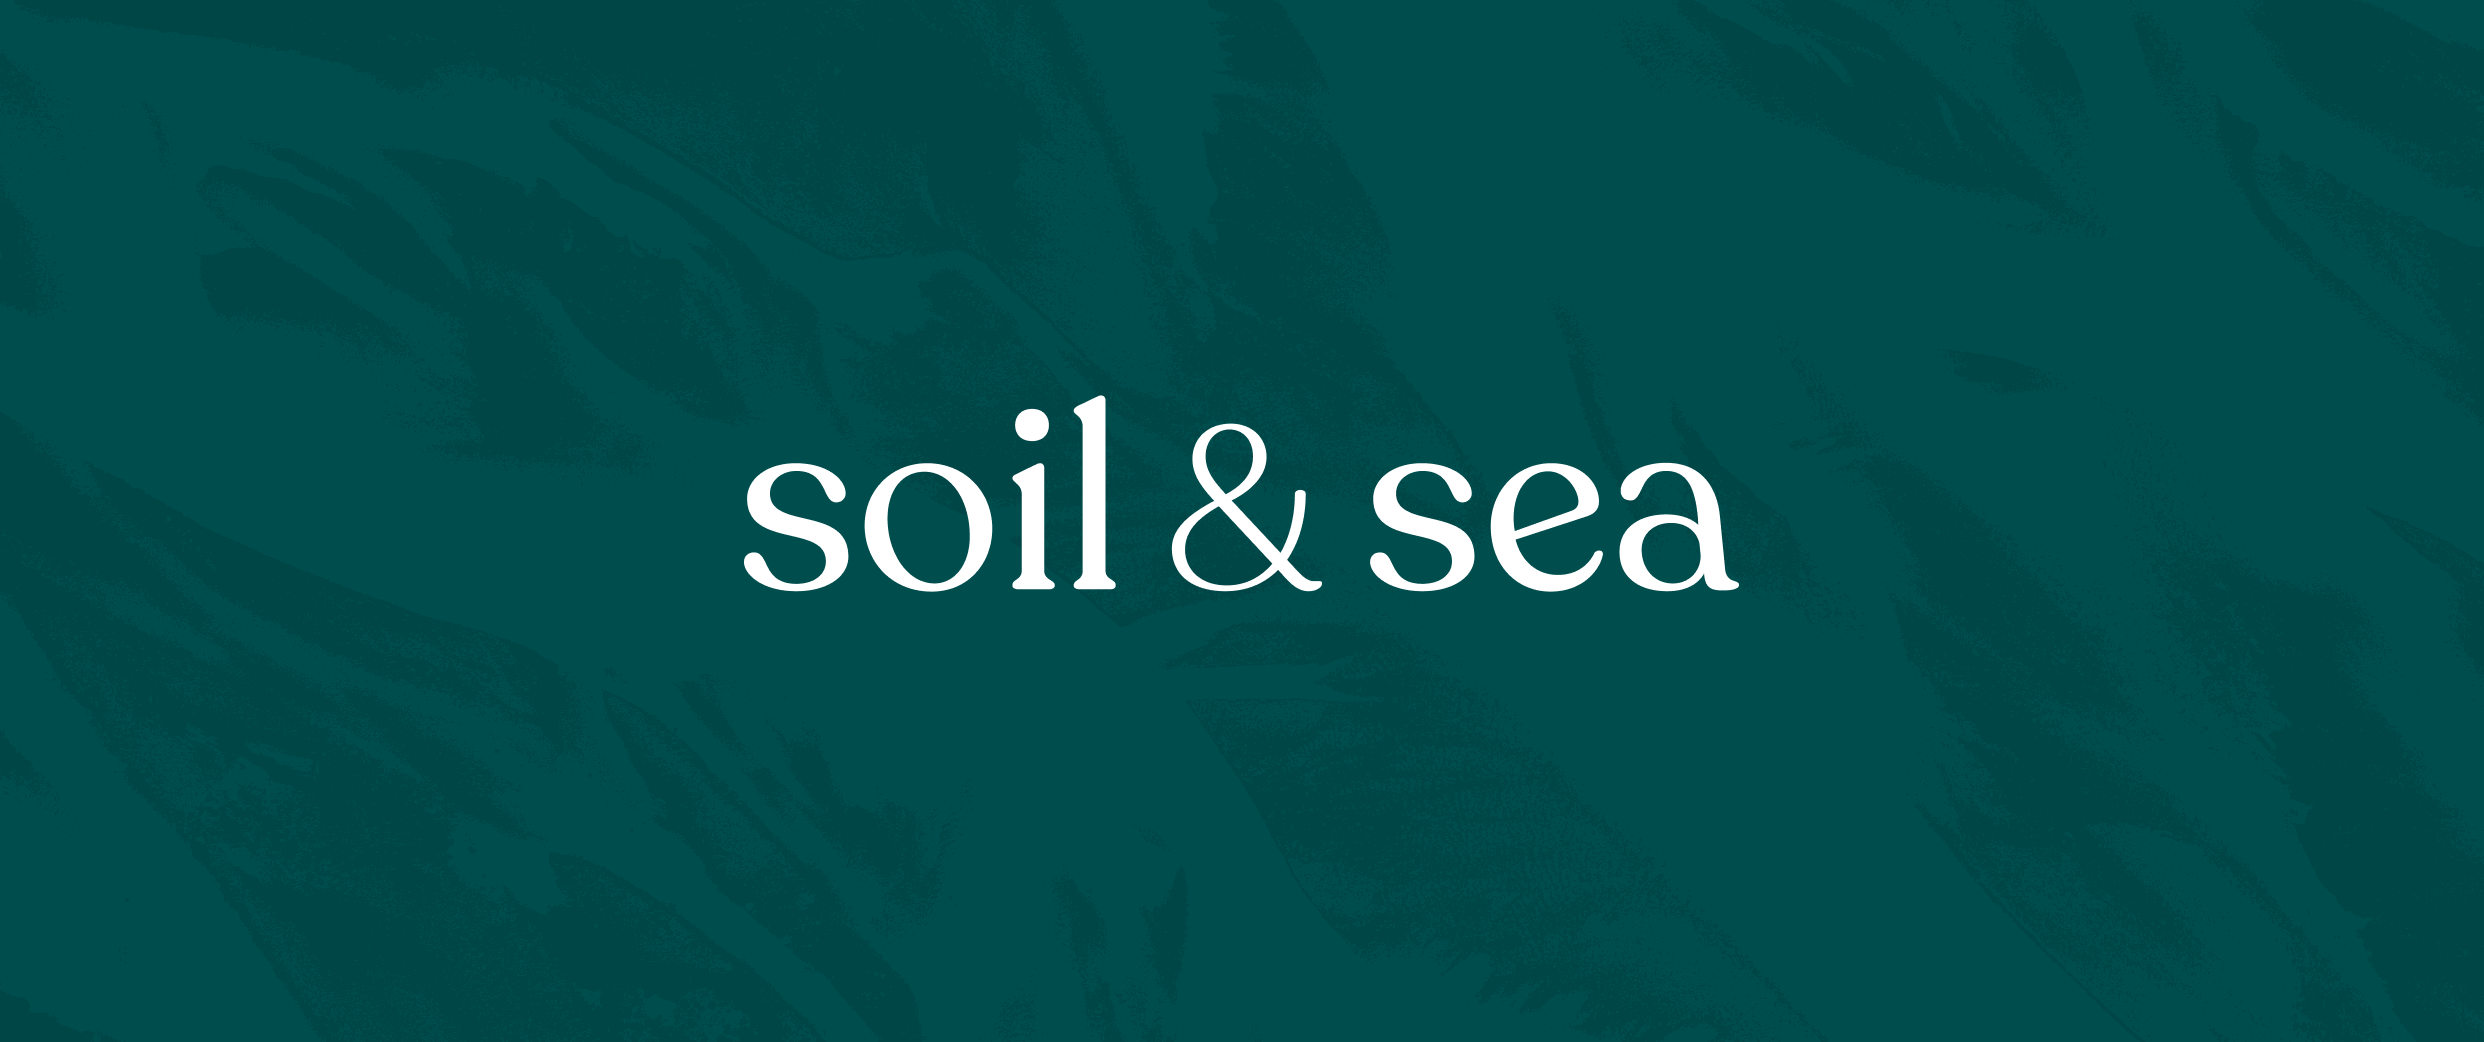 soilandsea1